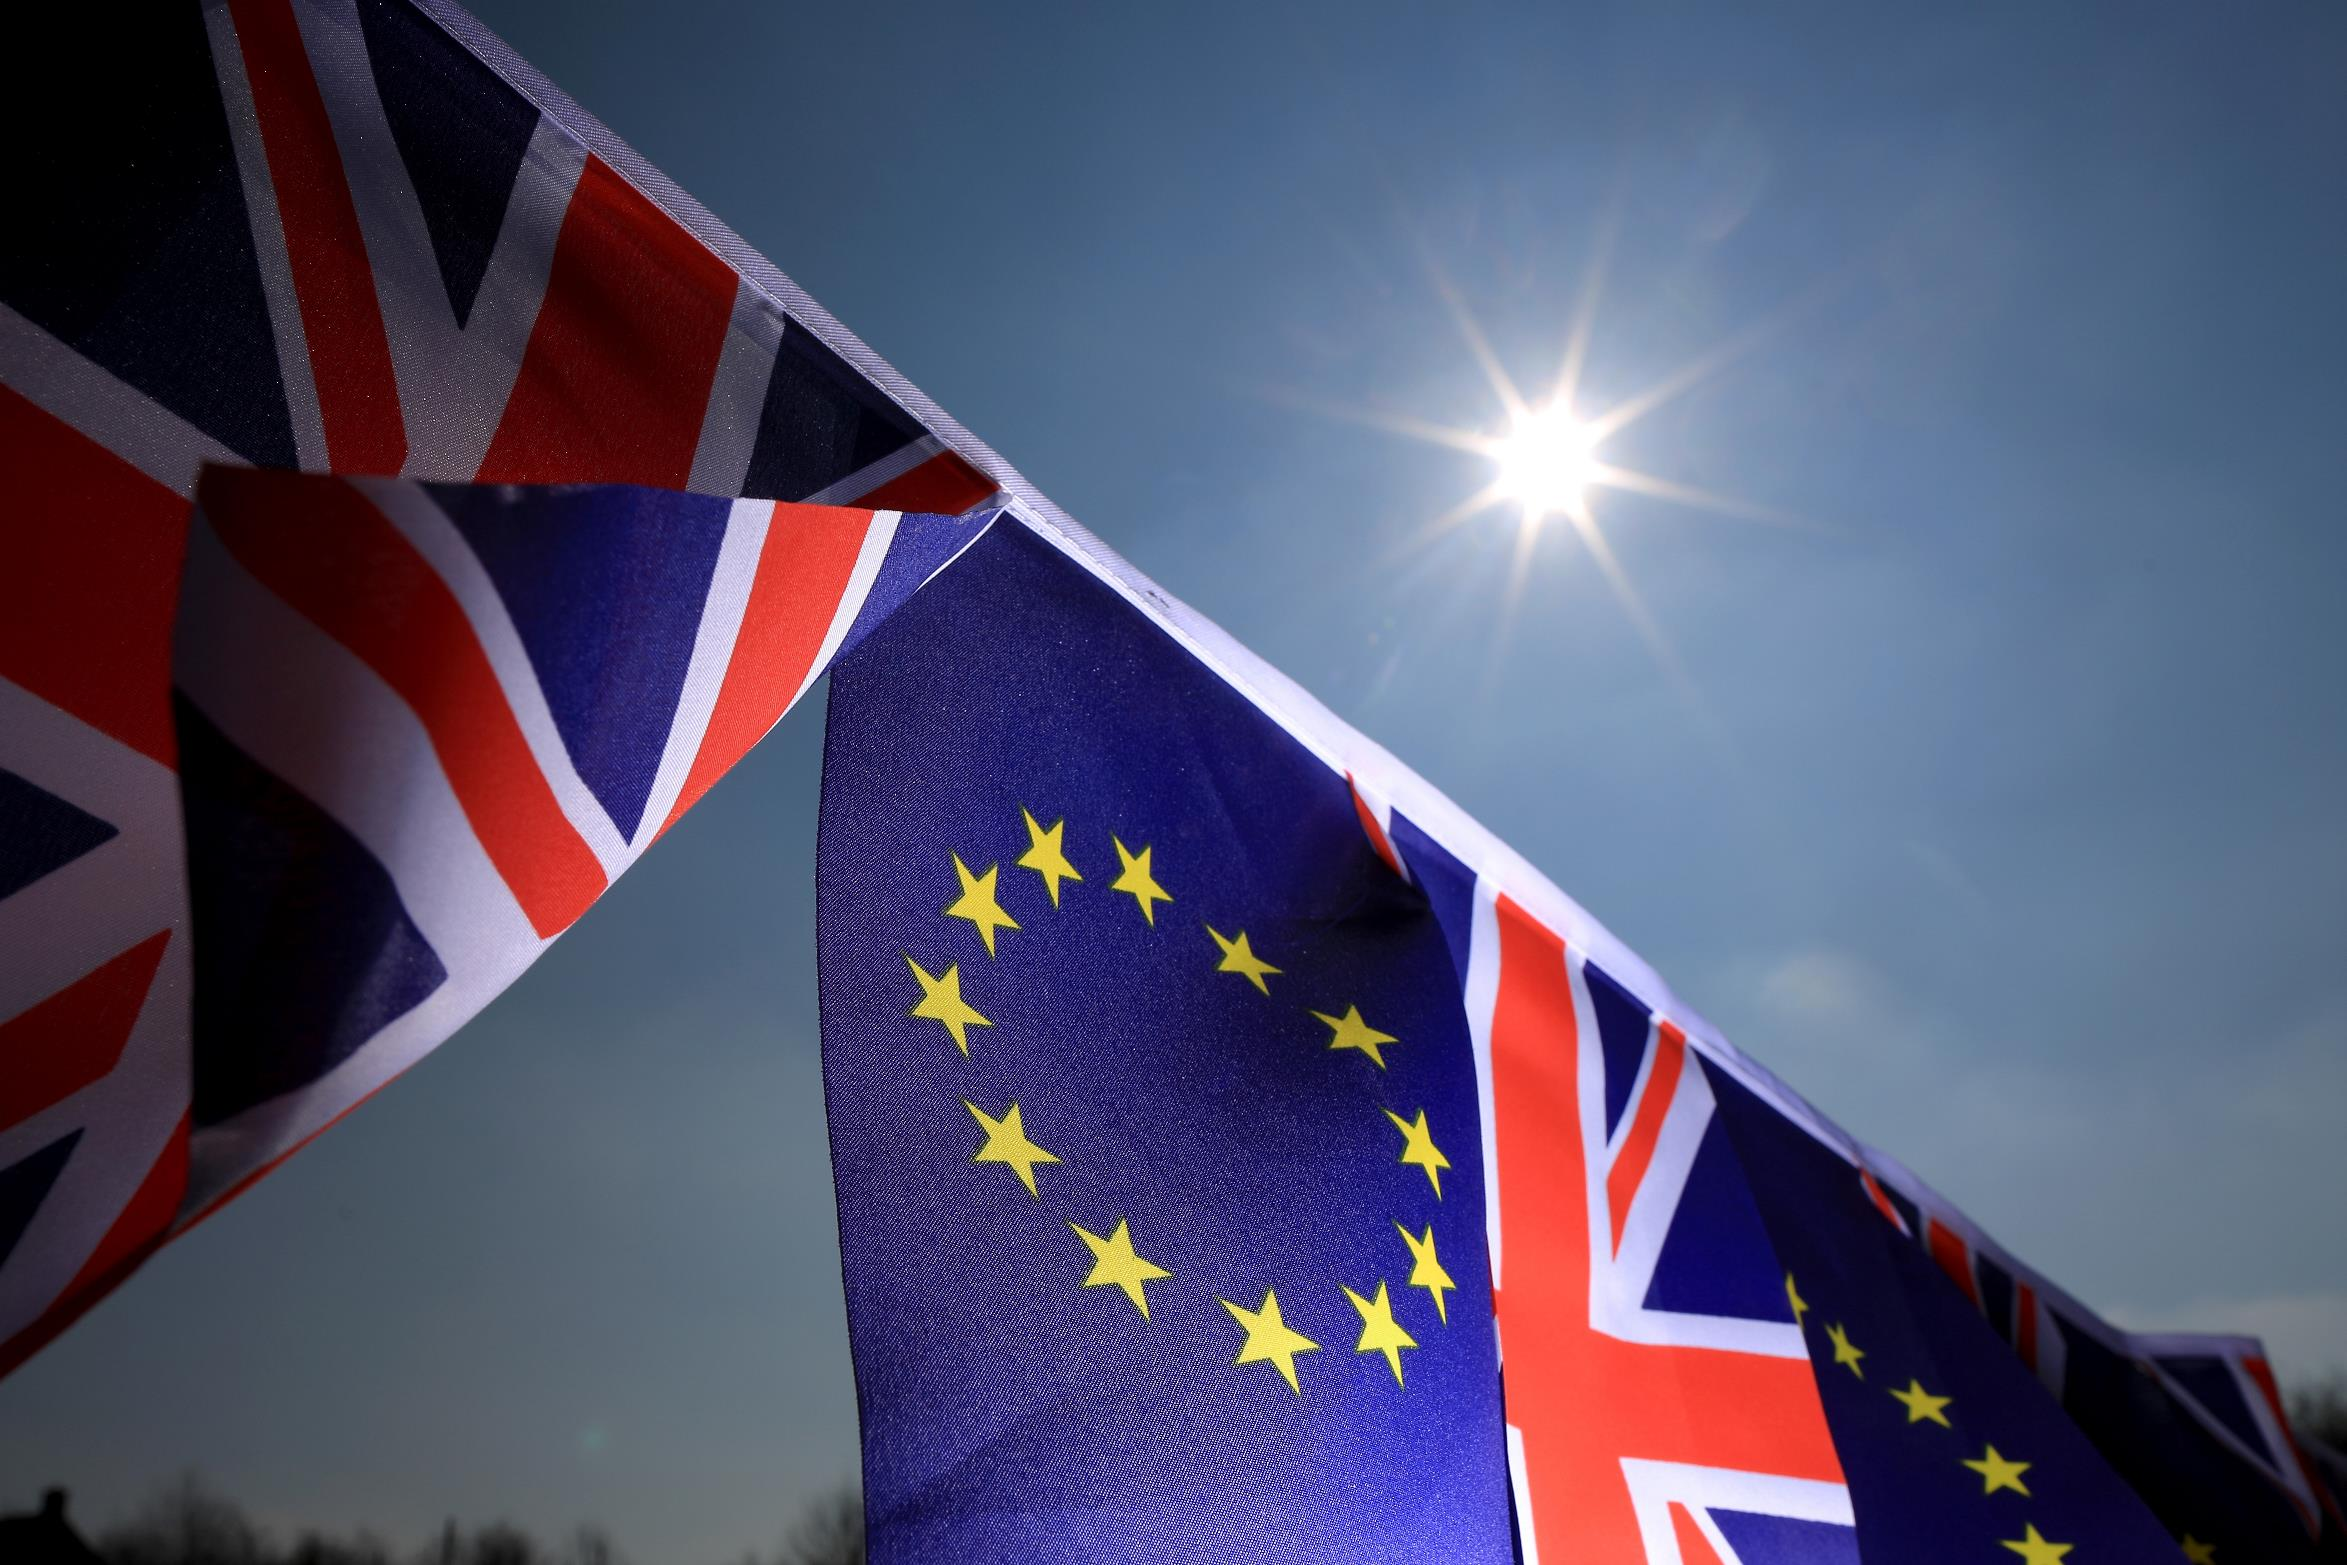 Brexit o remain? Ovvero la guerra commerciale anglo-tedesca